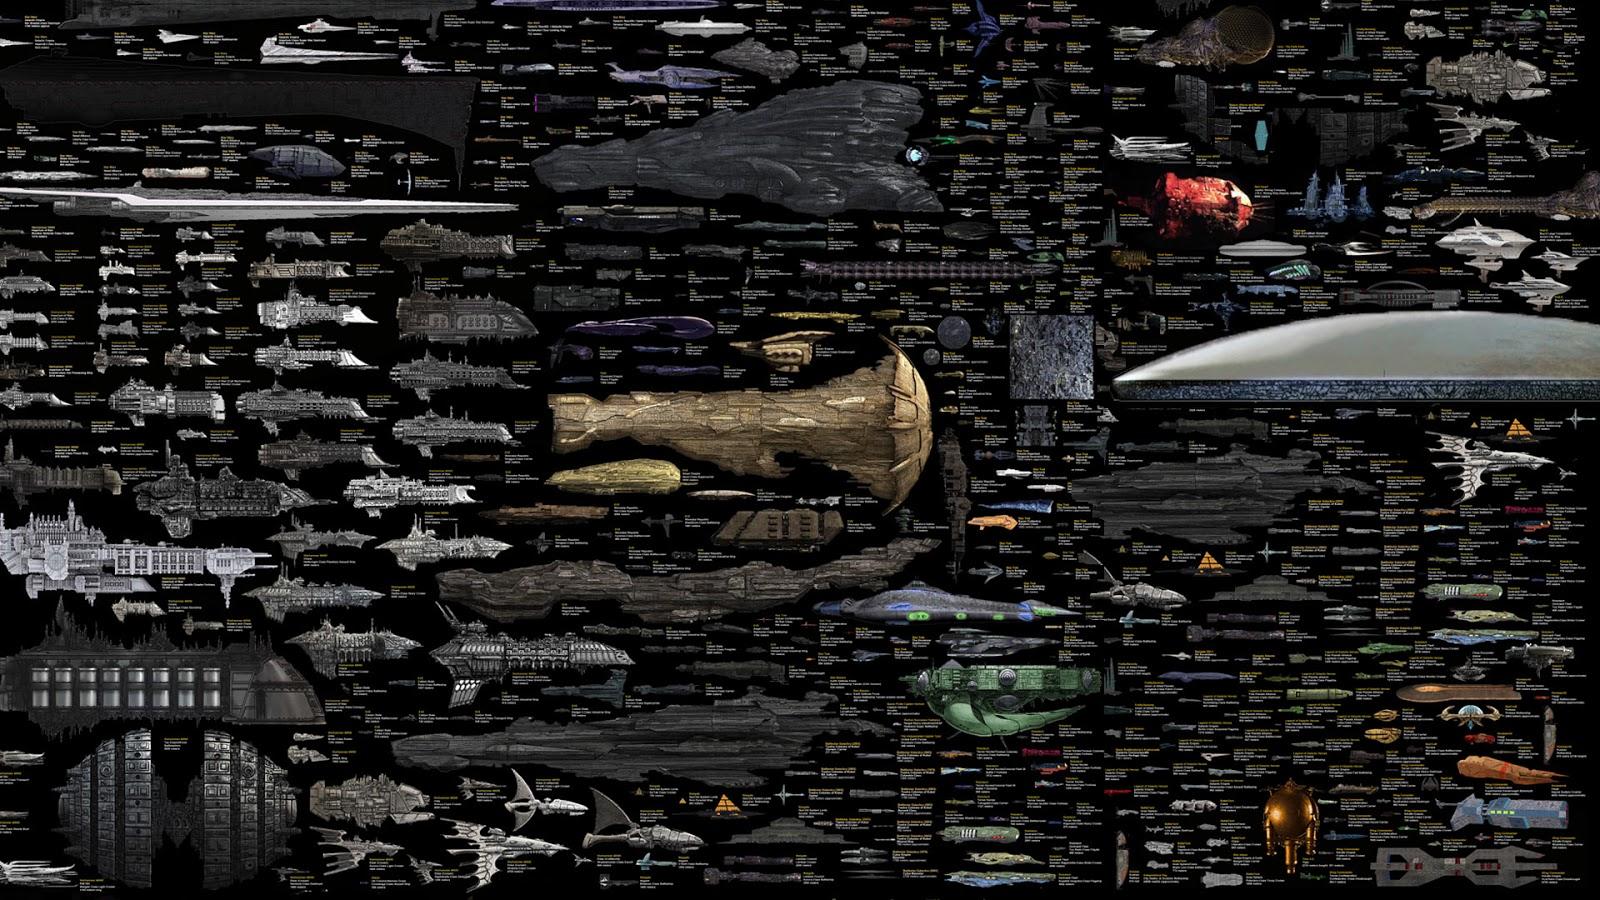 s star wars starship wallpapers - photo #29